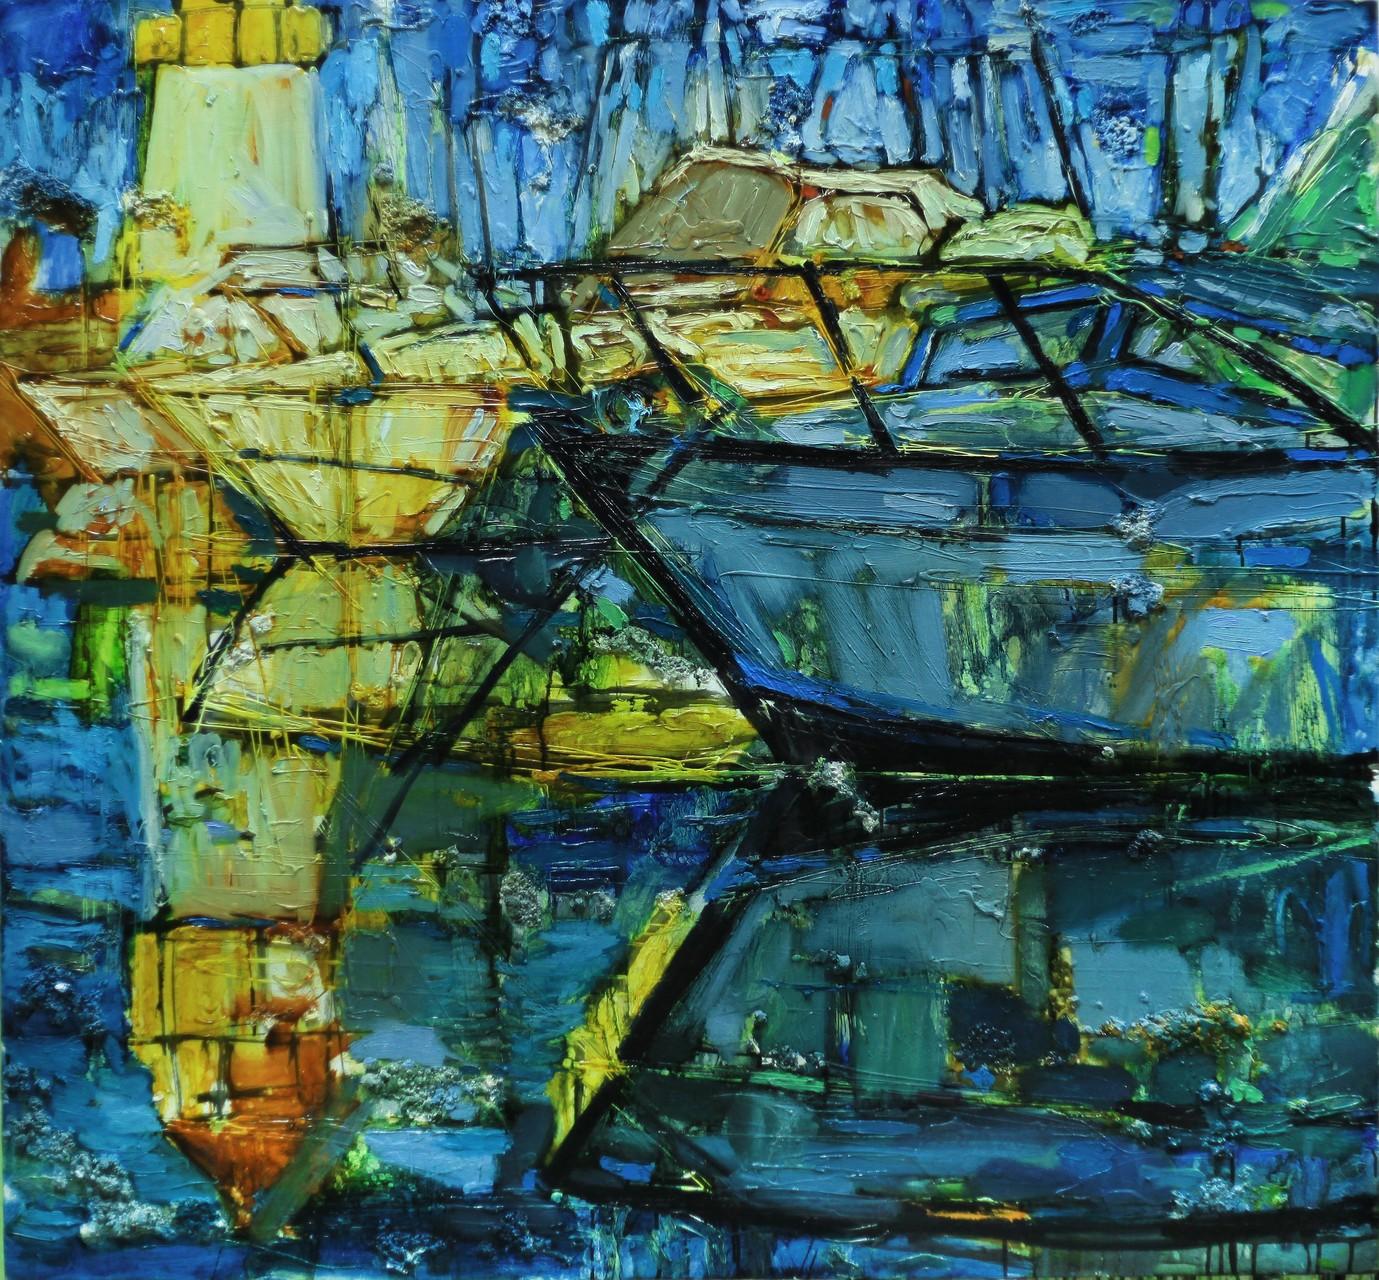 К. Поединщикова.       Лодки.      2014 г.      Холст, масло.     130х140 см.